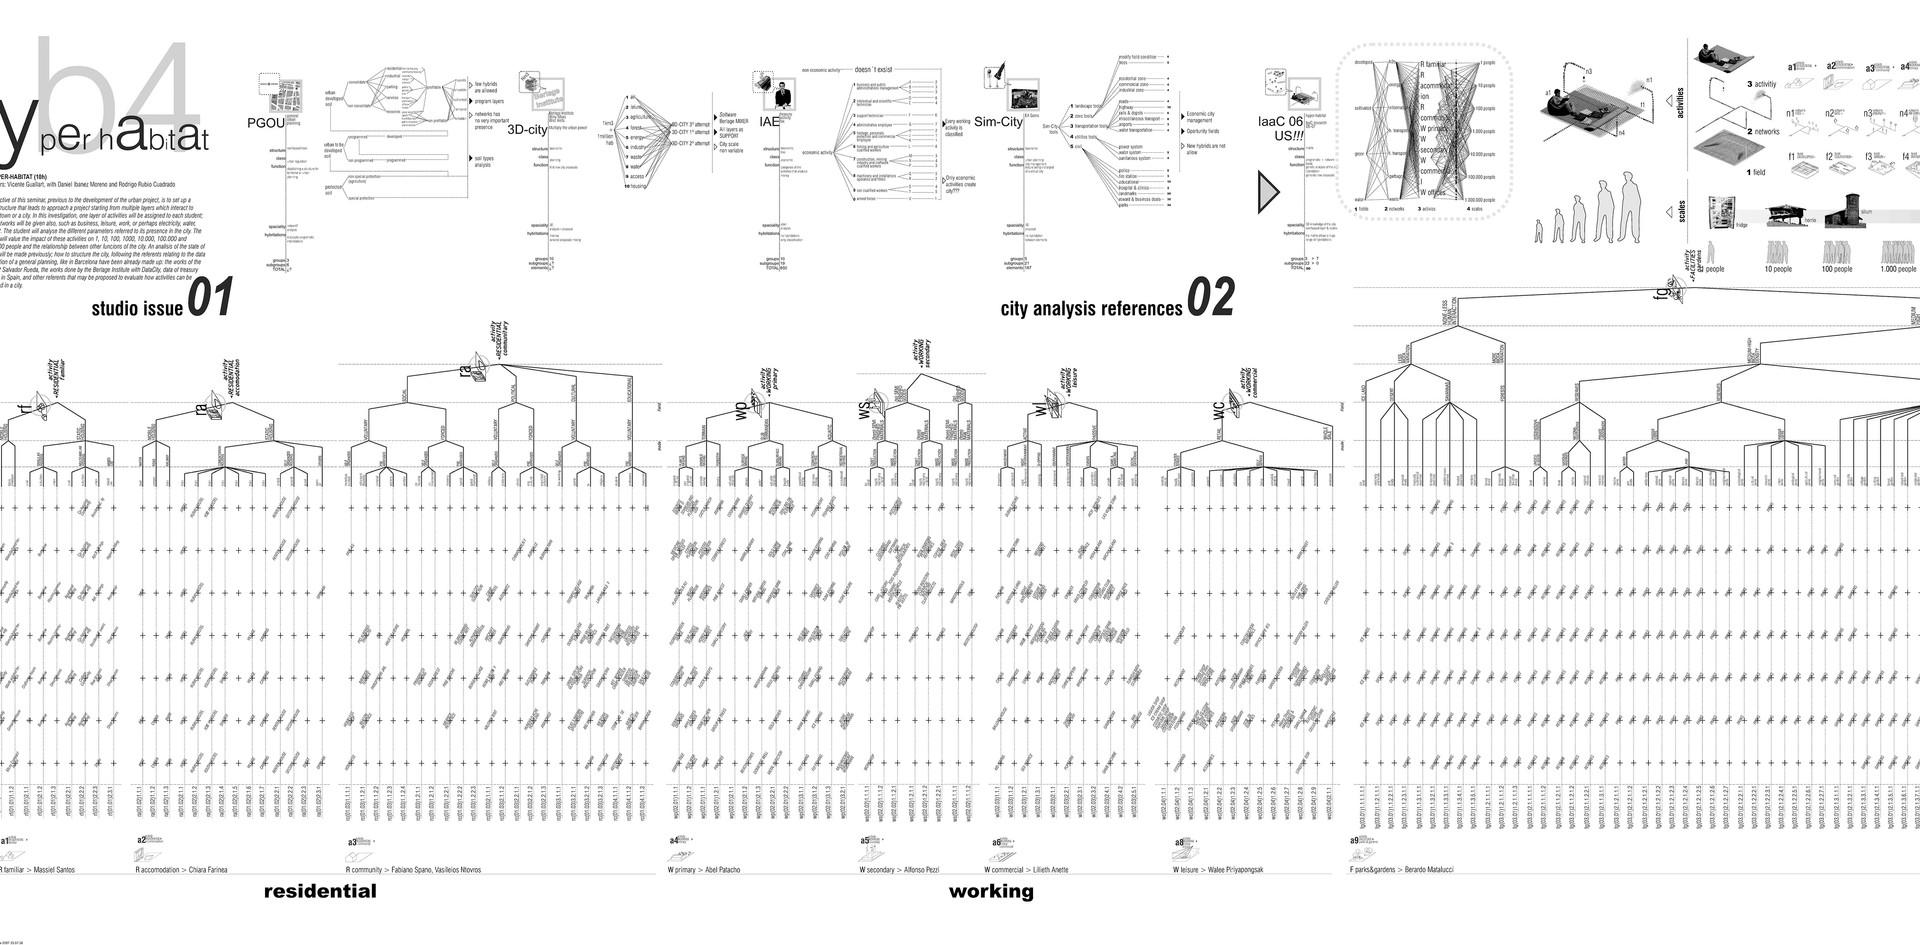 00 panelresumen (crop3).jpg